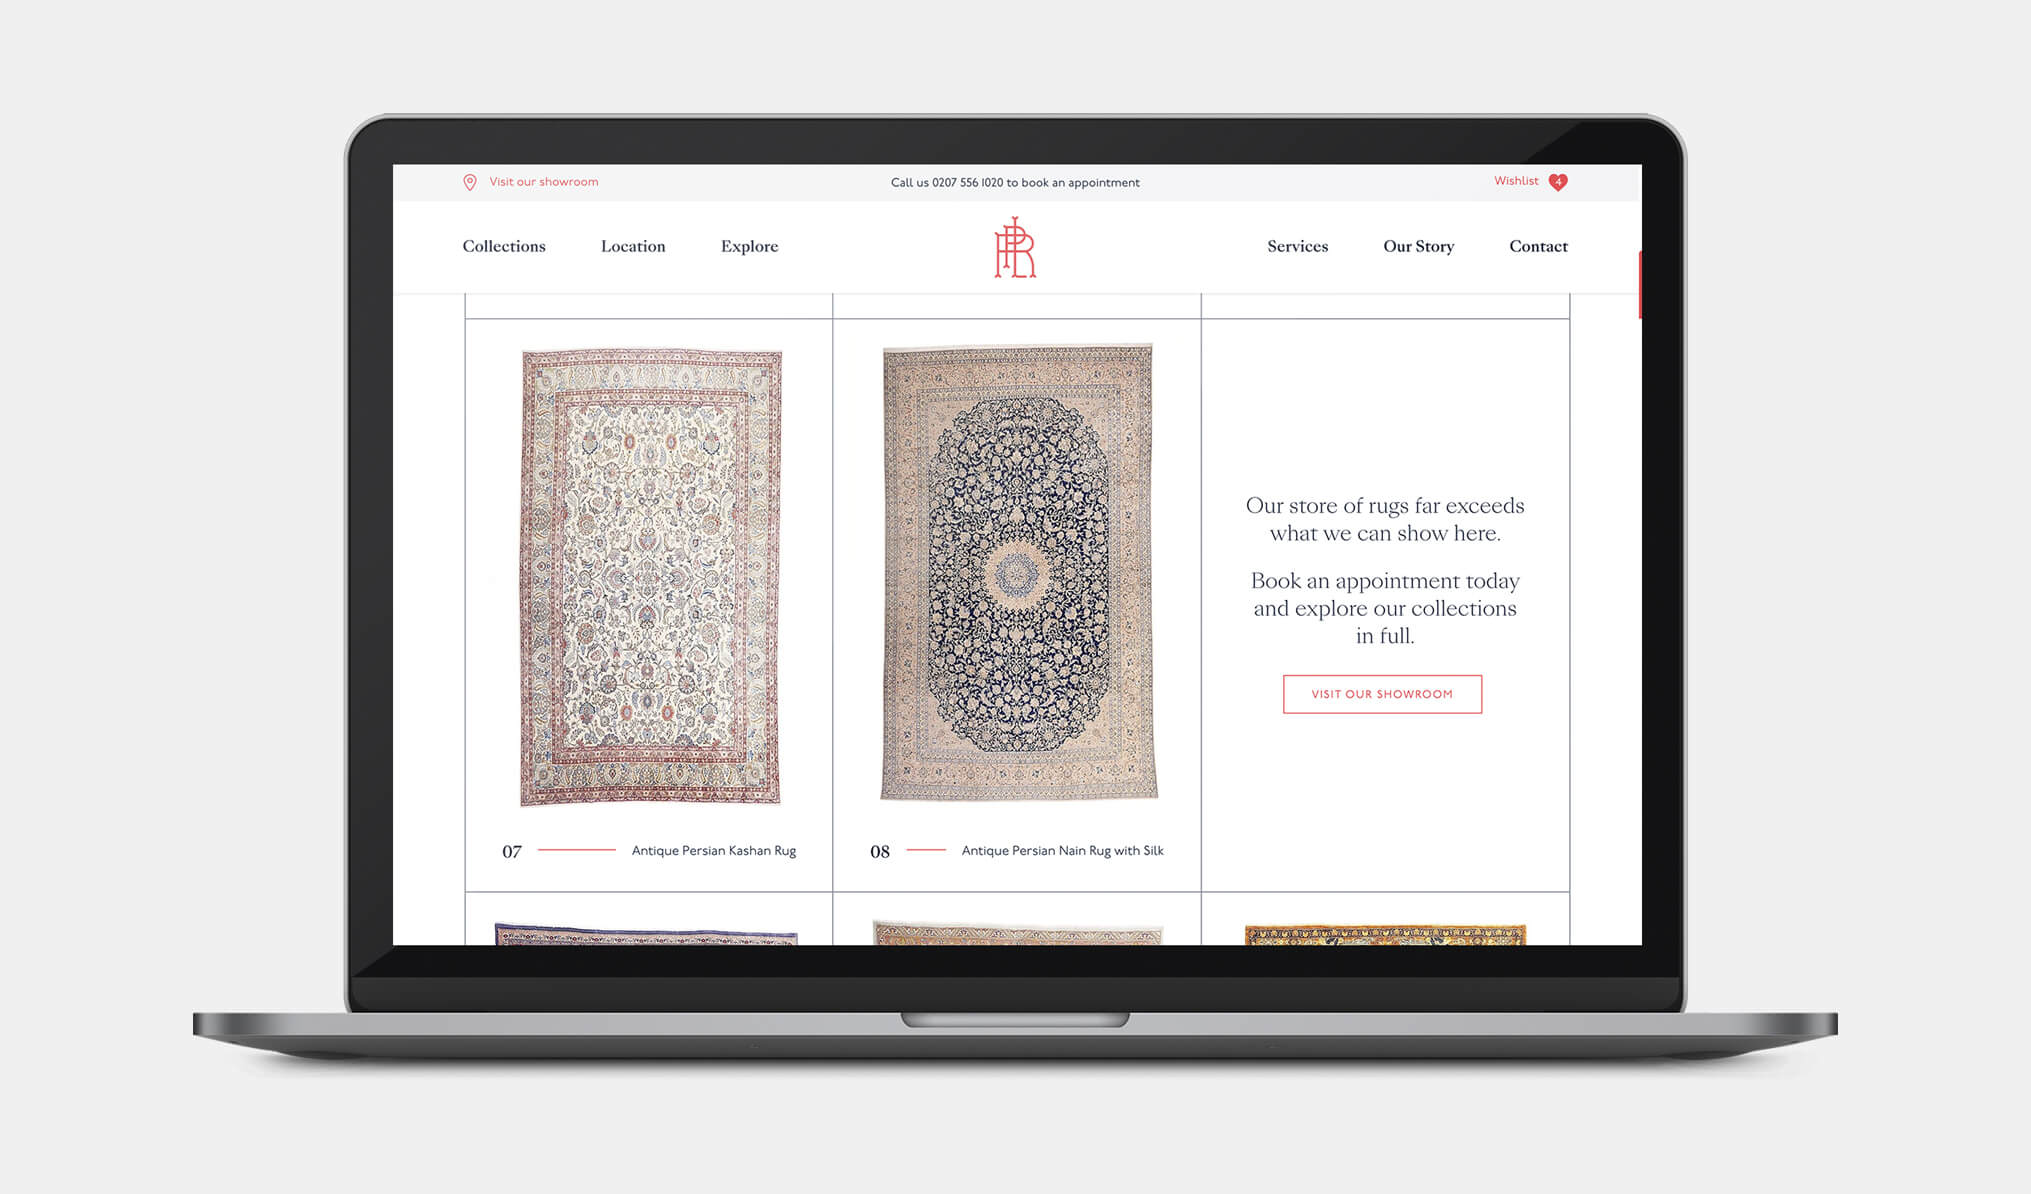 Chanelle-Sharp-Digital-Designer-Portfolio-London-Persian-Rug-Company-Desktop-3